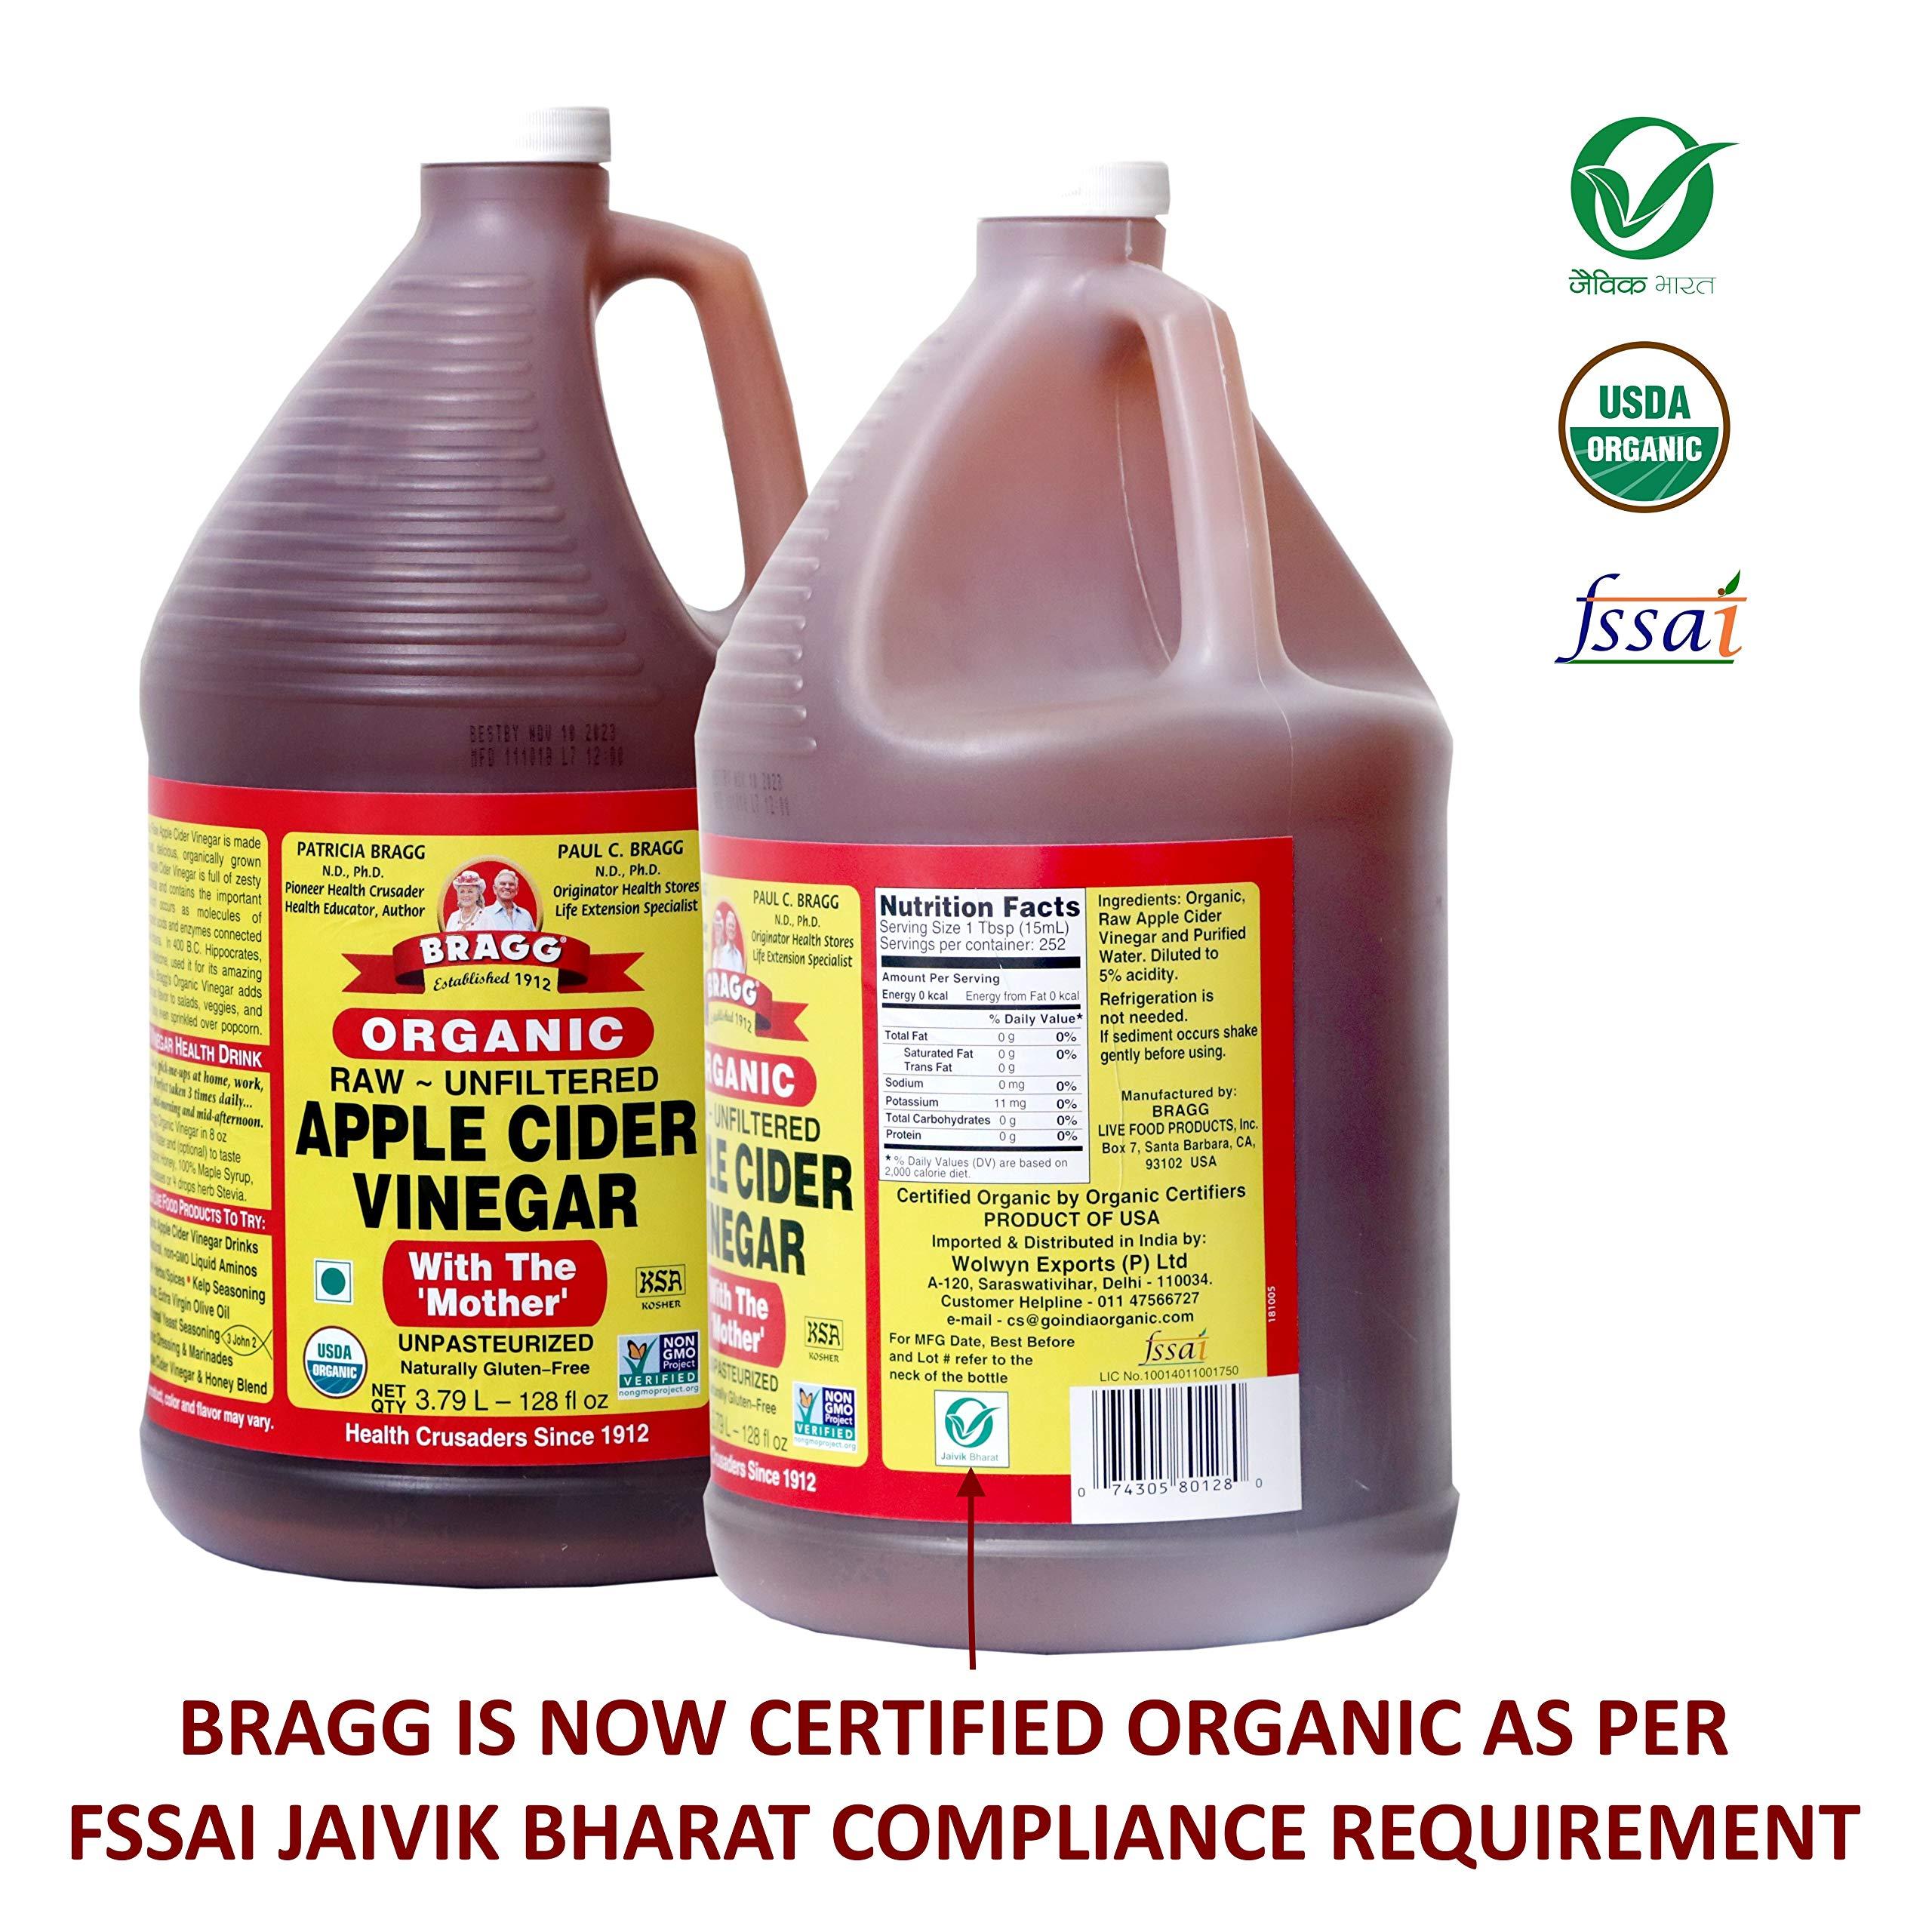 Organic Raw Apple Cider Vinegar Unfiltered Bragg 1 Gal (128oz) Liquid by Bragg (Image #6)